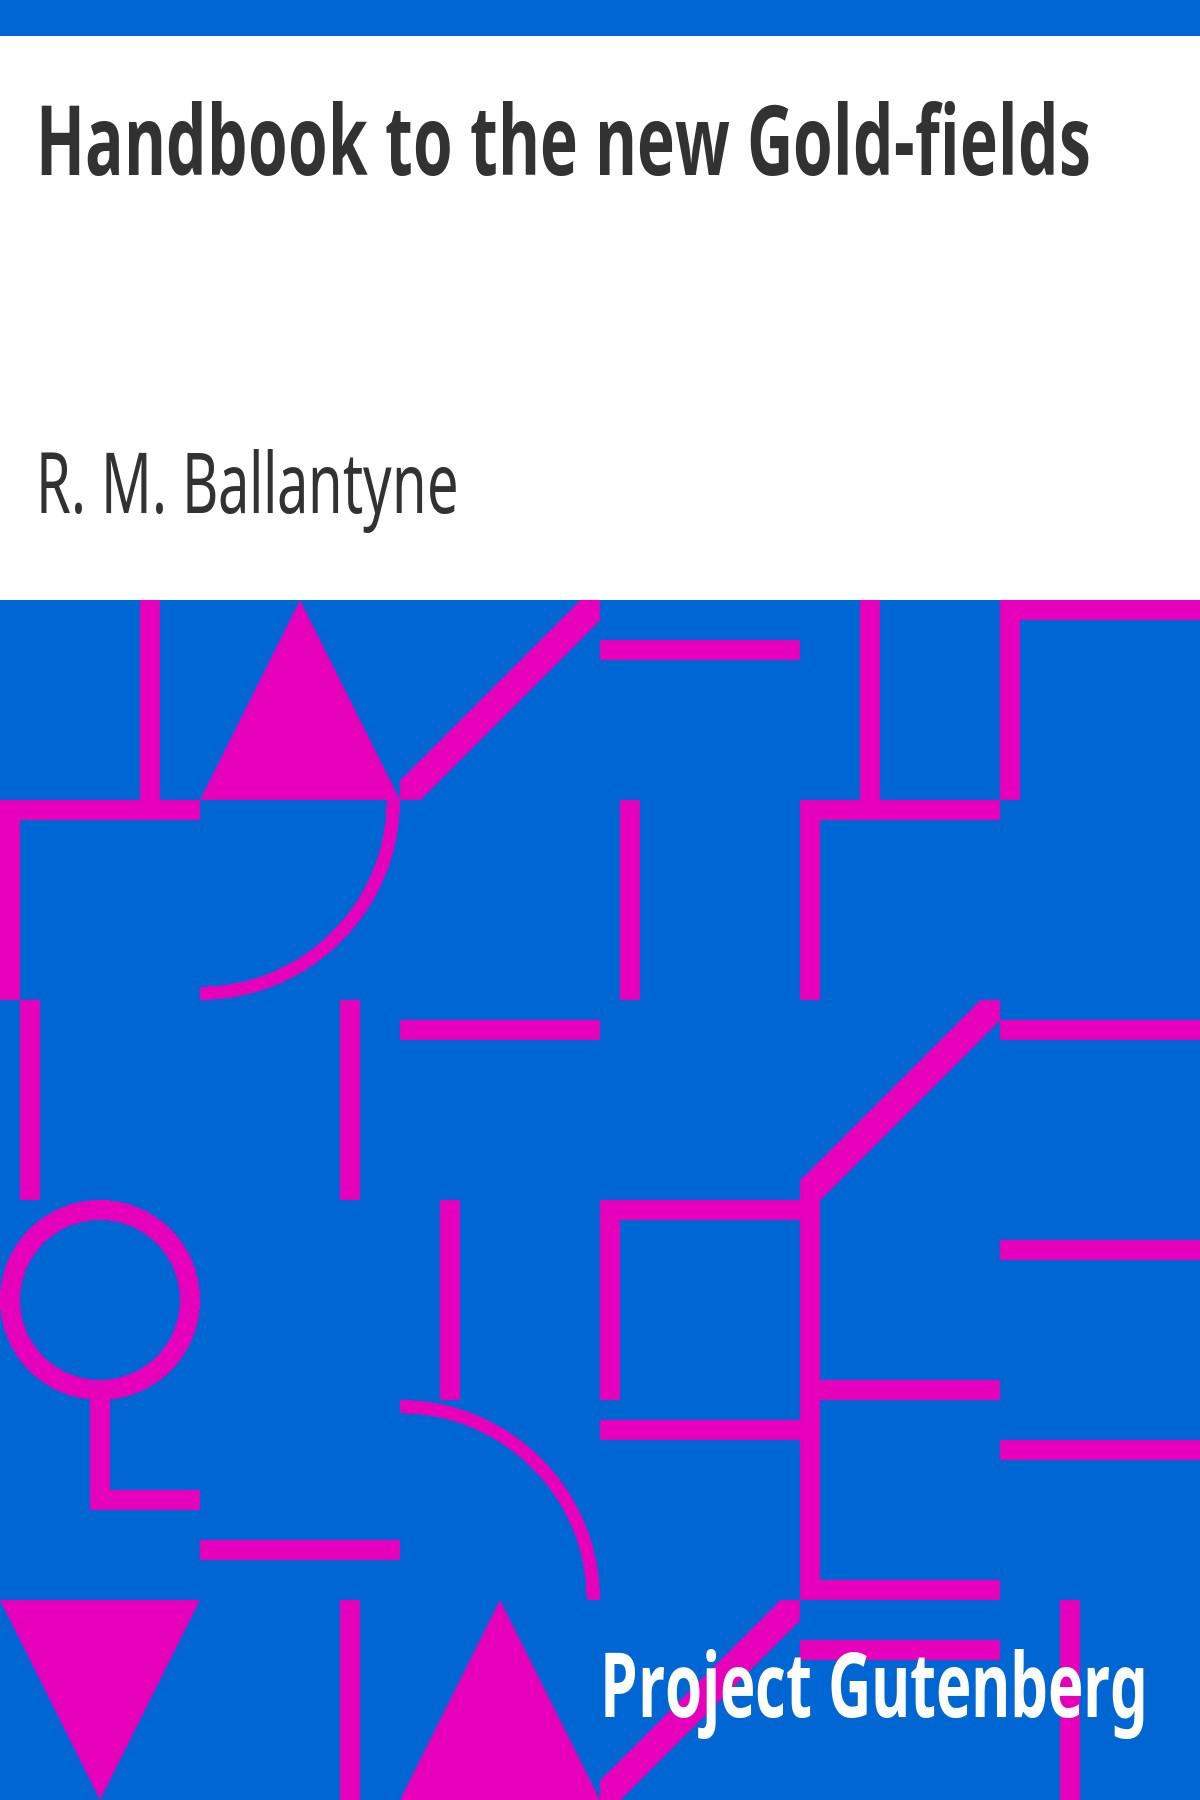 R. M. Ballantyne Handbook to the new Gold-fields